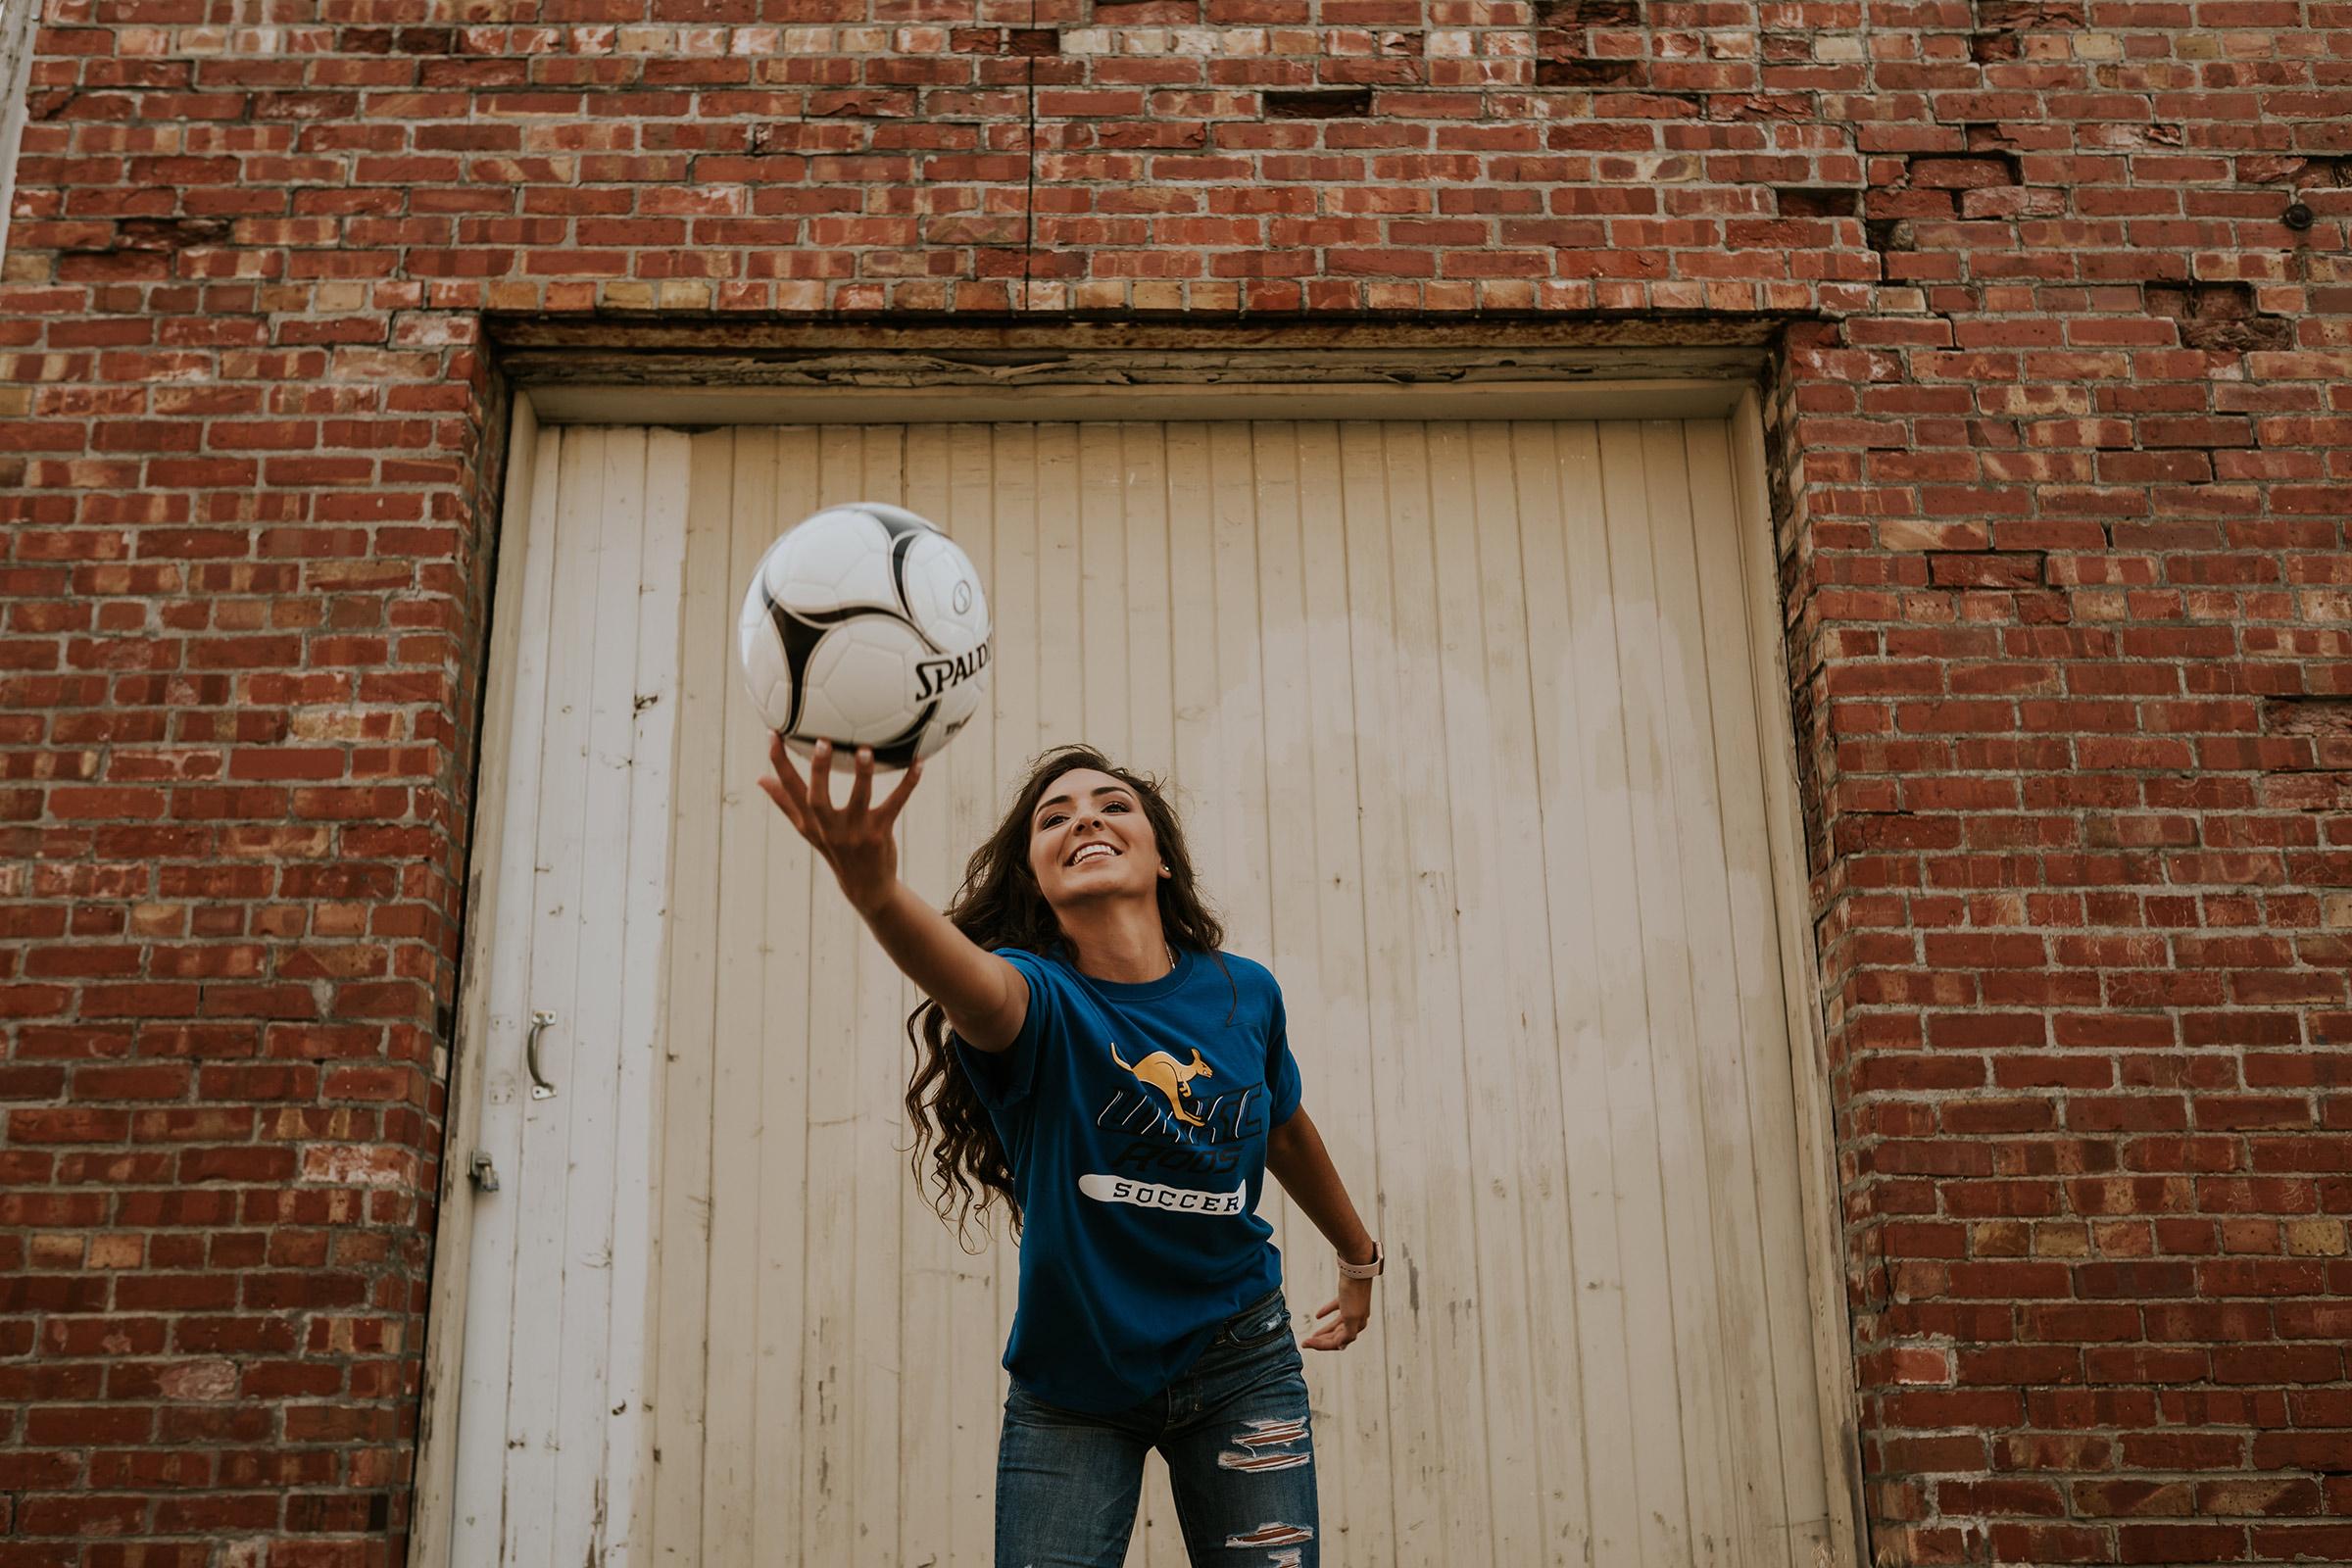 lizzy-senior-girl-catching-soccor-ball-ankeny-high-school-desmoines-iowa-raelyn-ramey-photography-61.jpg